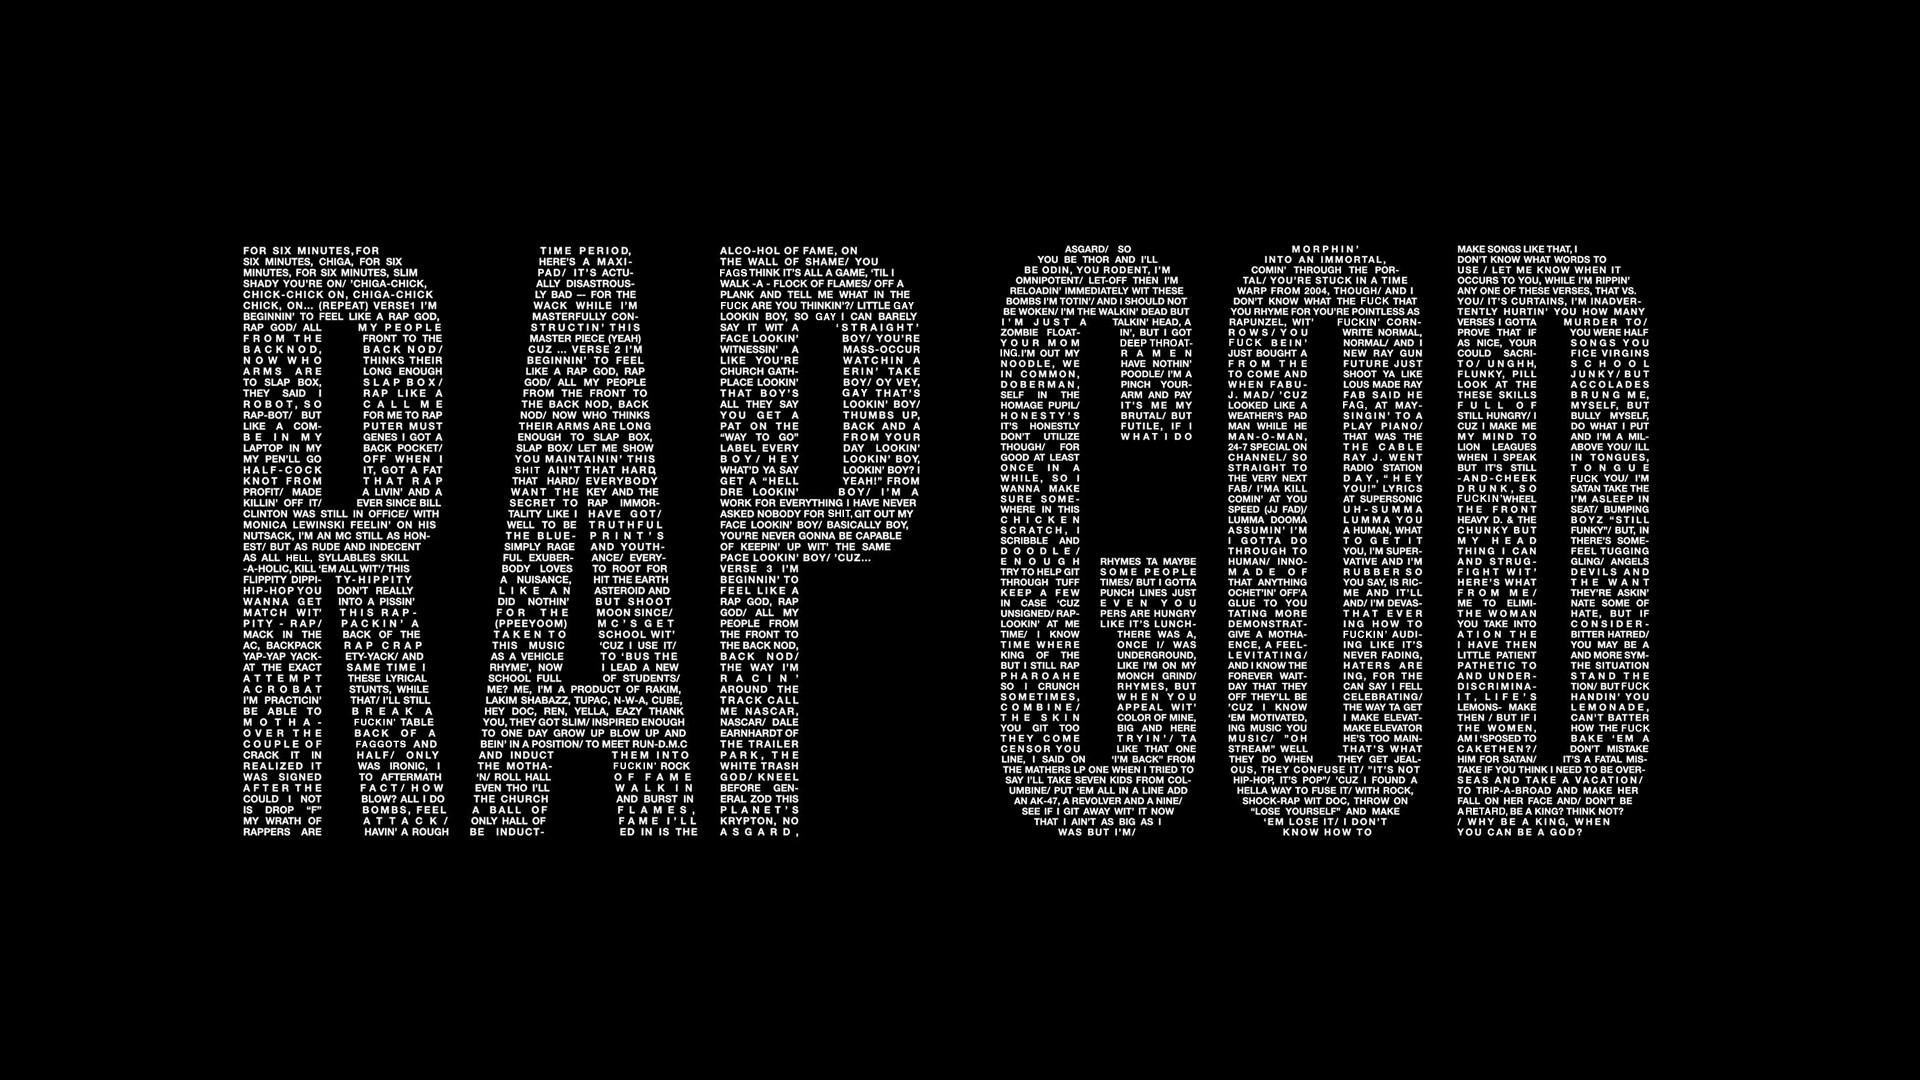 … rap wallpapers on kubipet com …